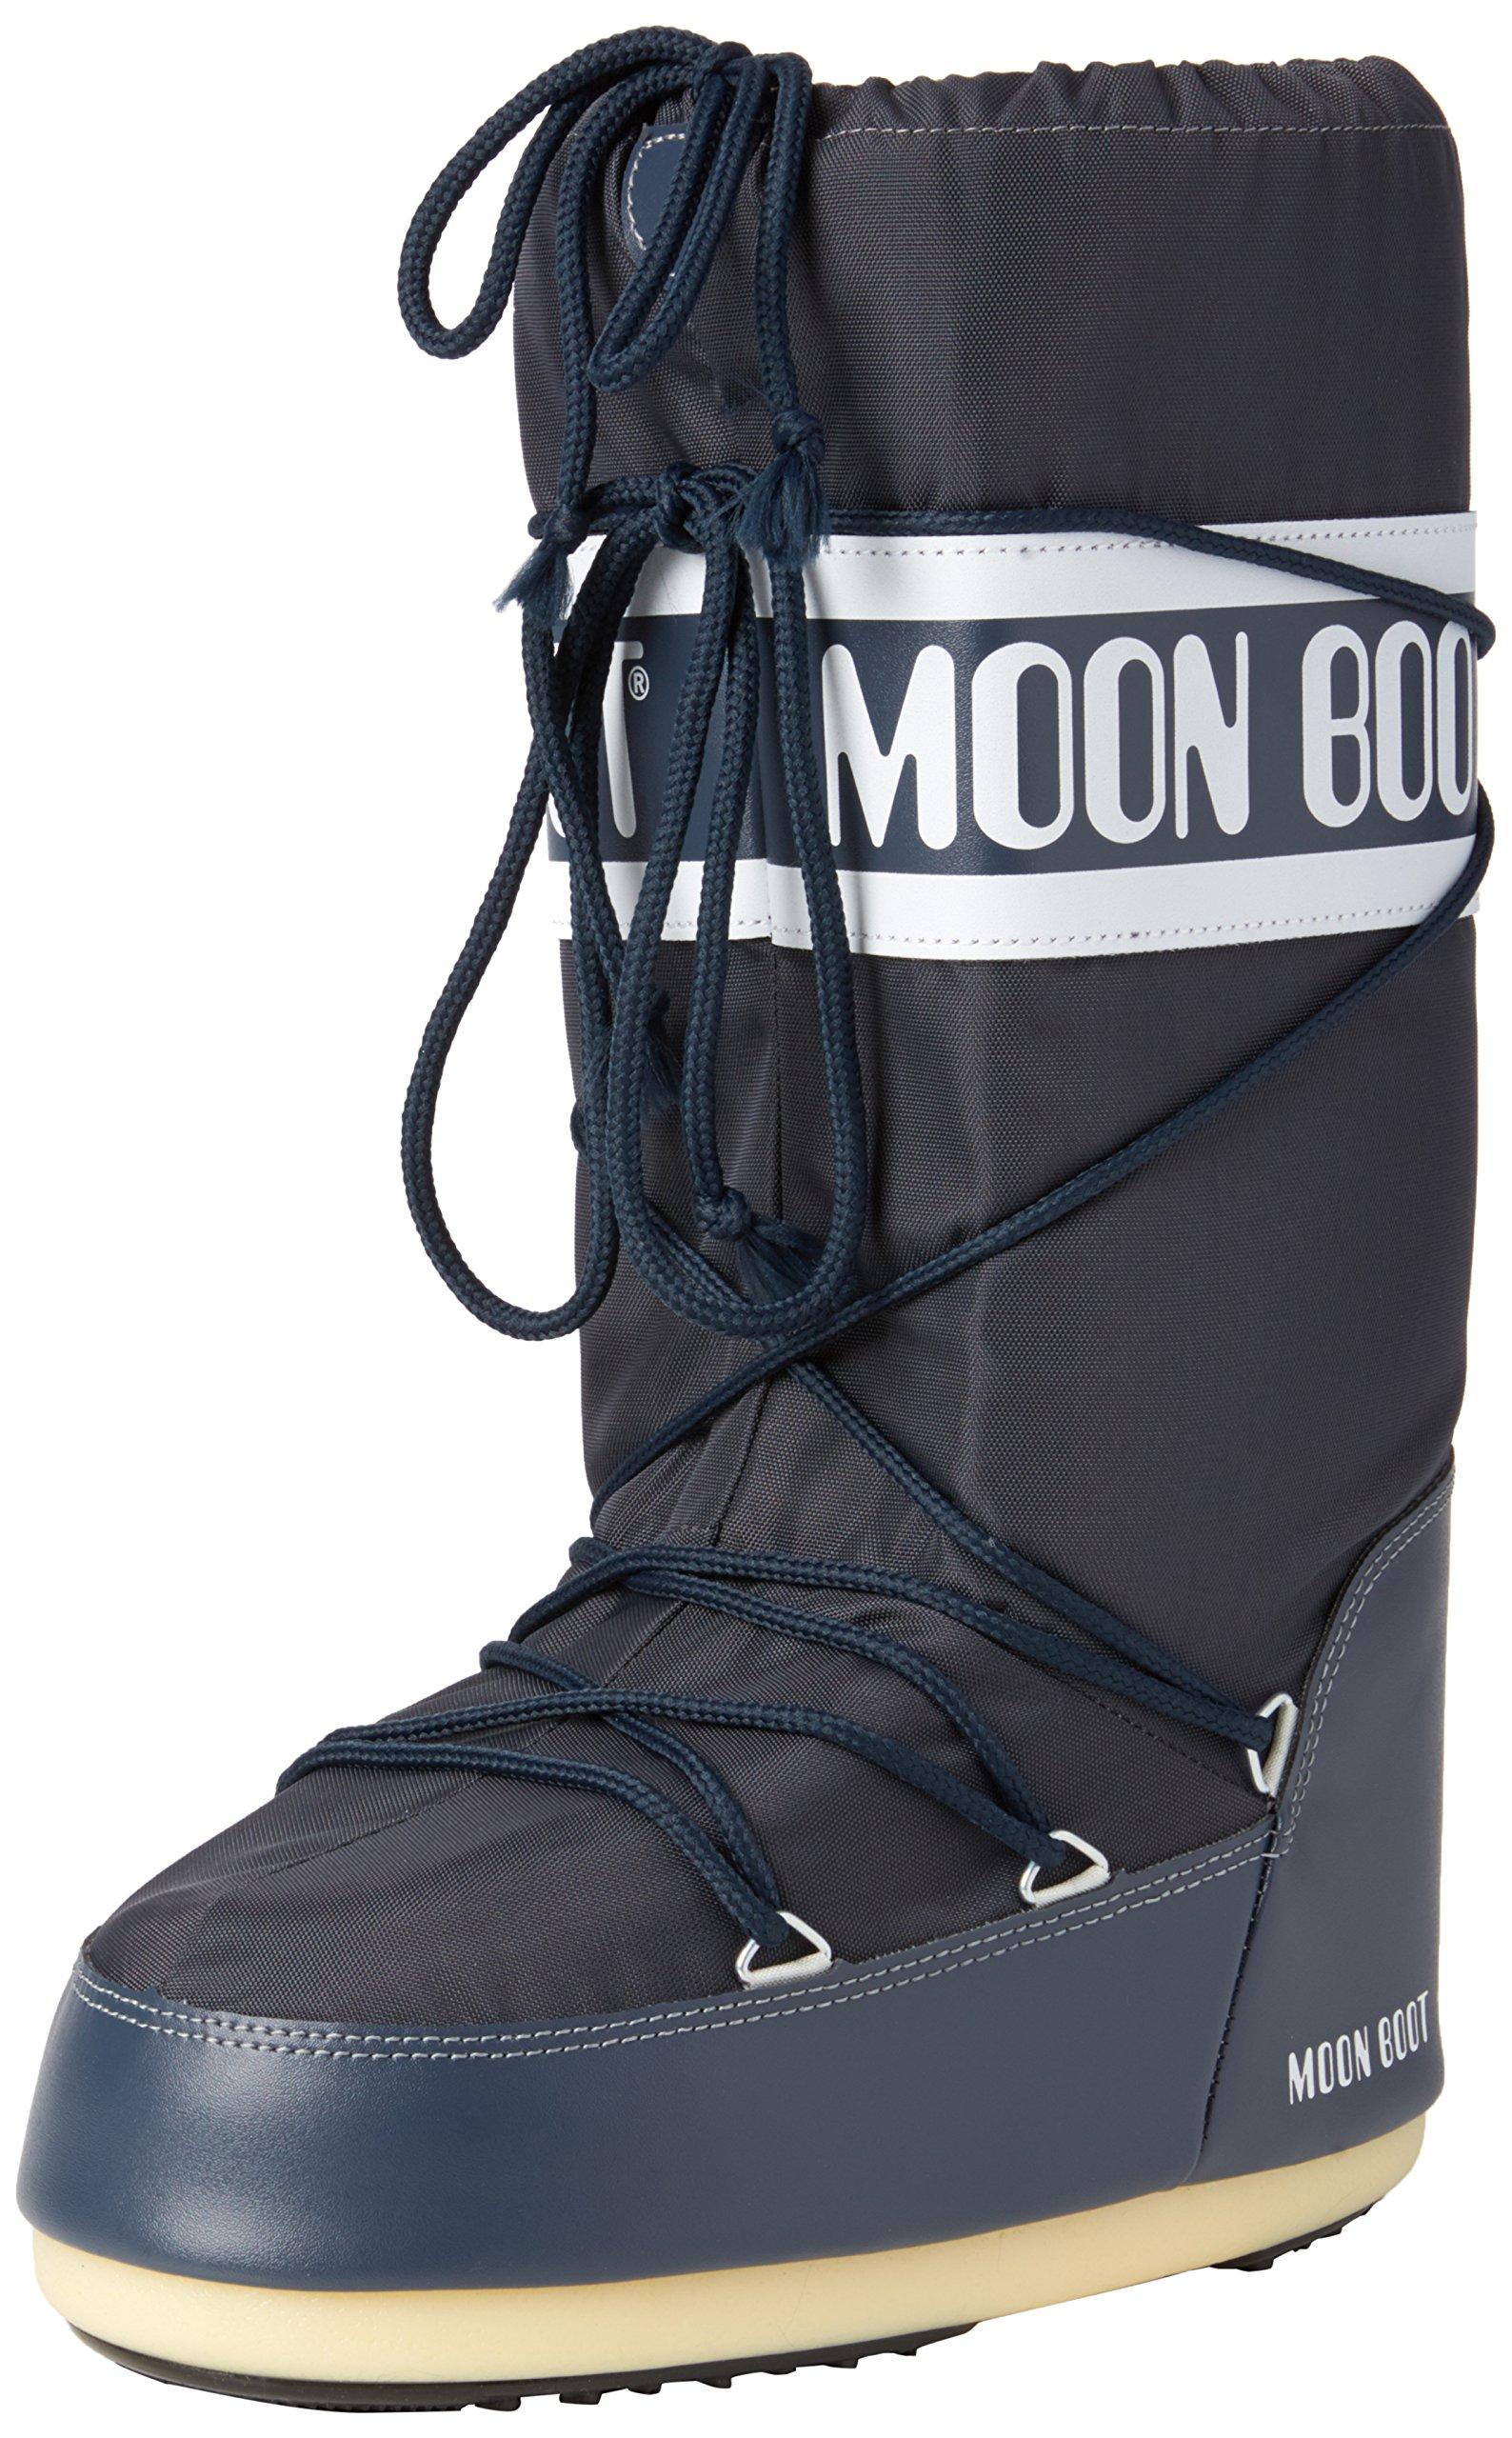 Moon Boot Unisex Adults Tecnica Nylon Winter Waterproof Knee Boot - Blue Jeans - 9-10.5 Mens